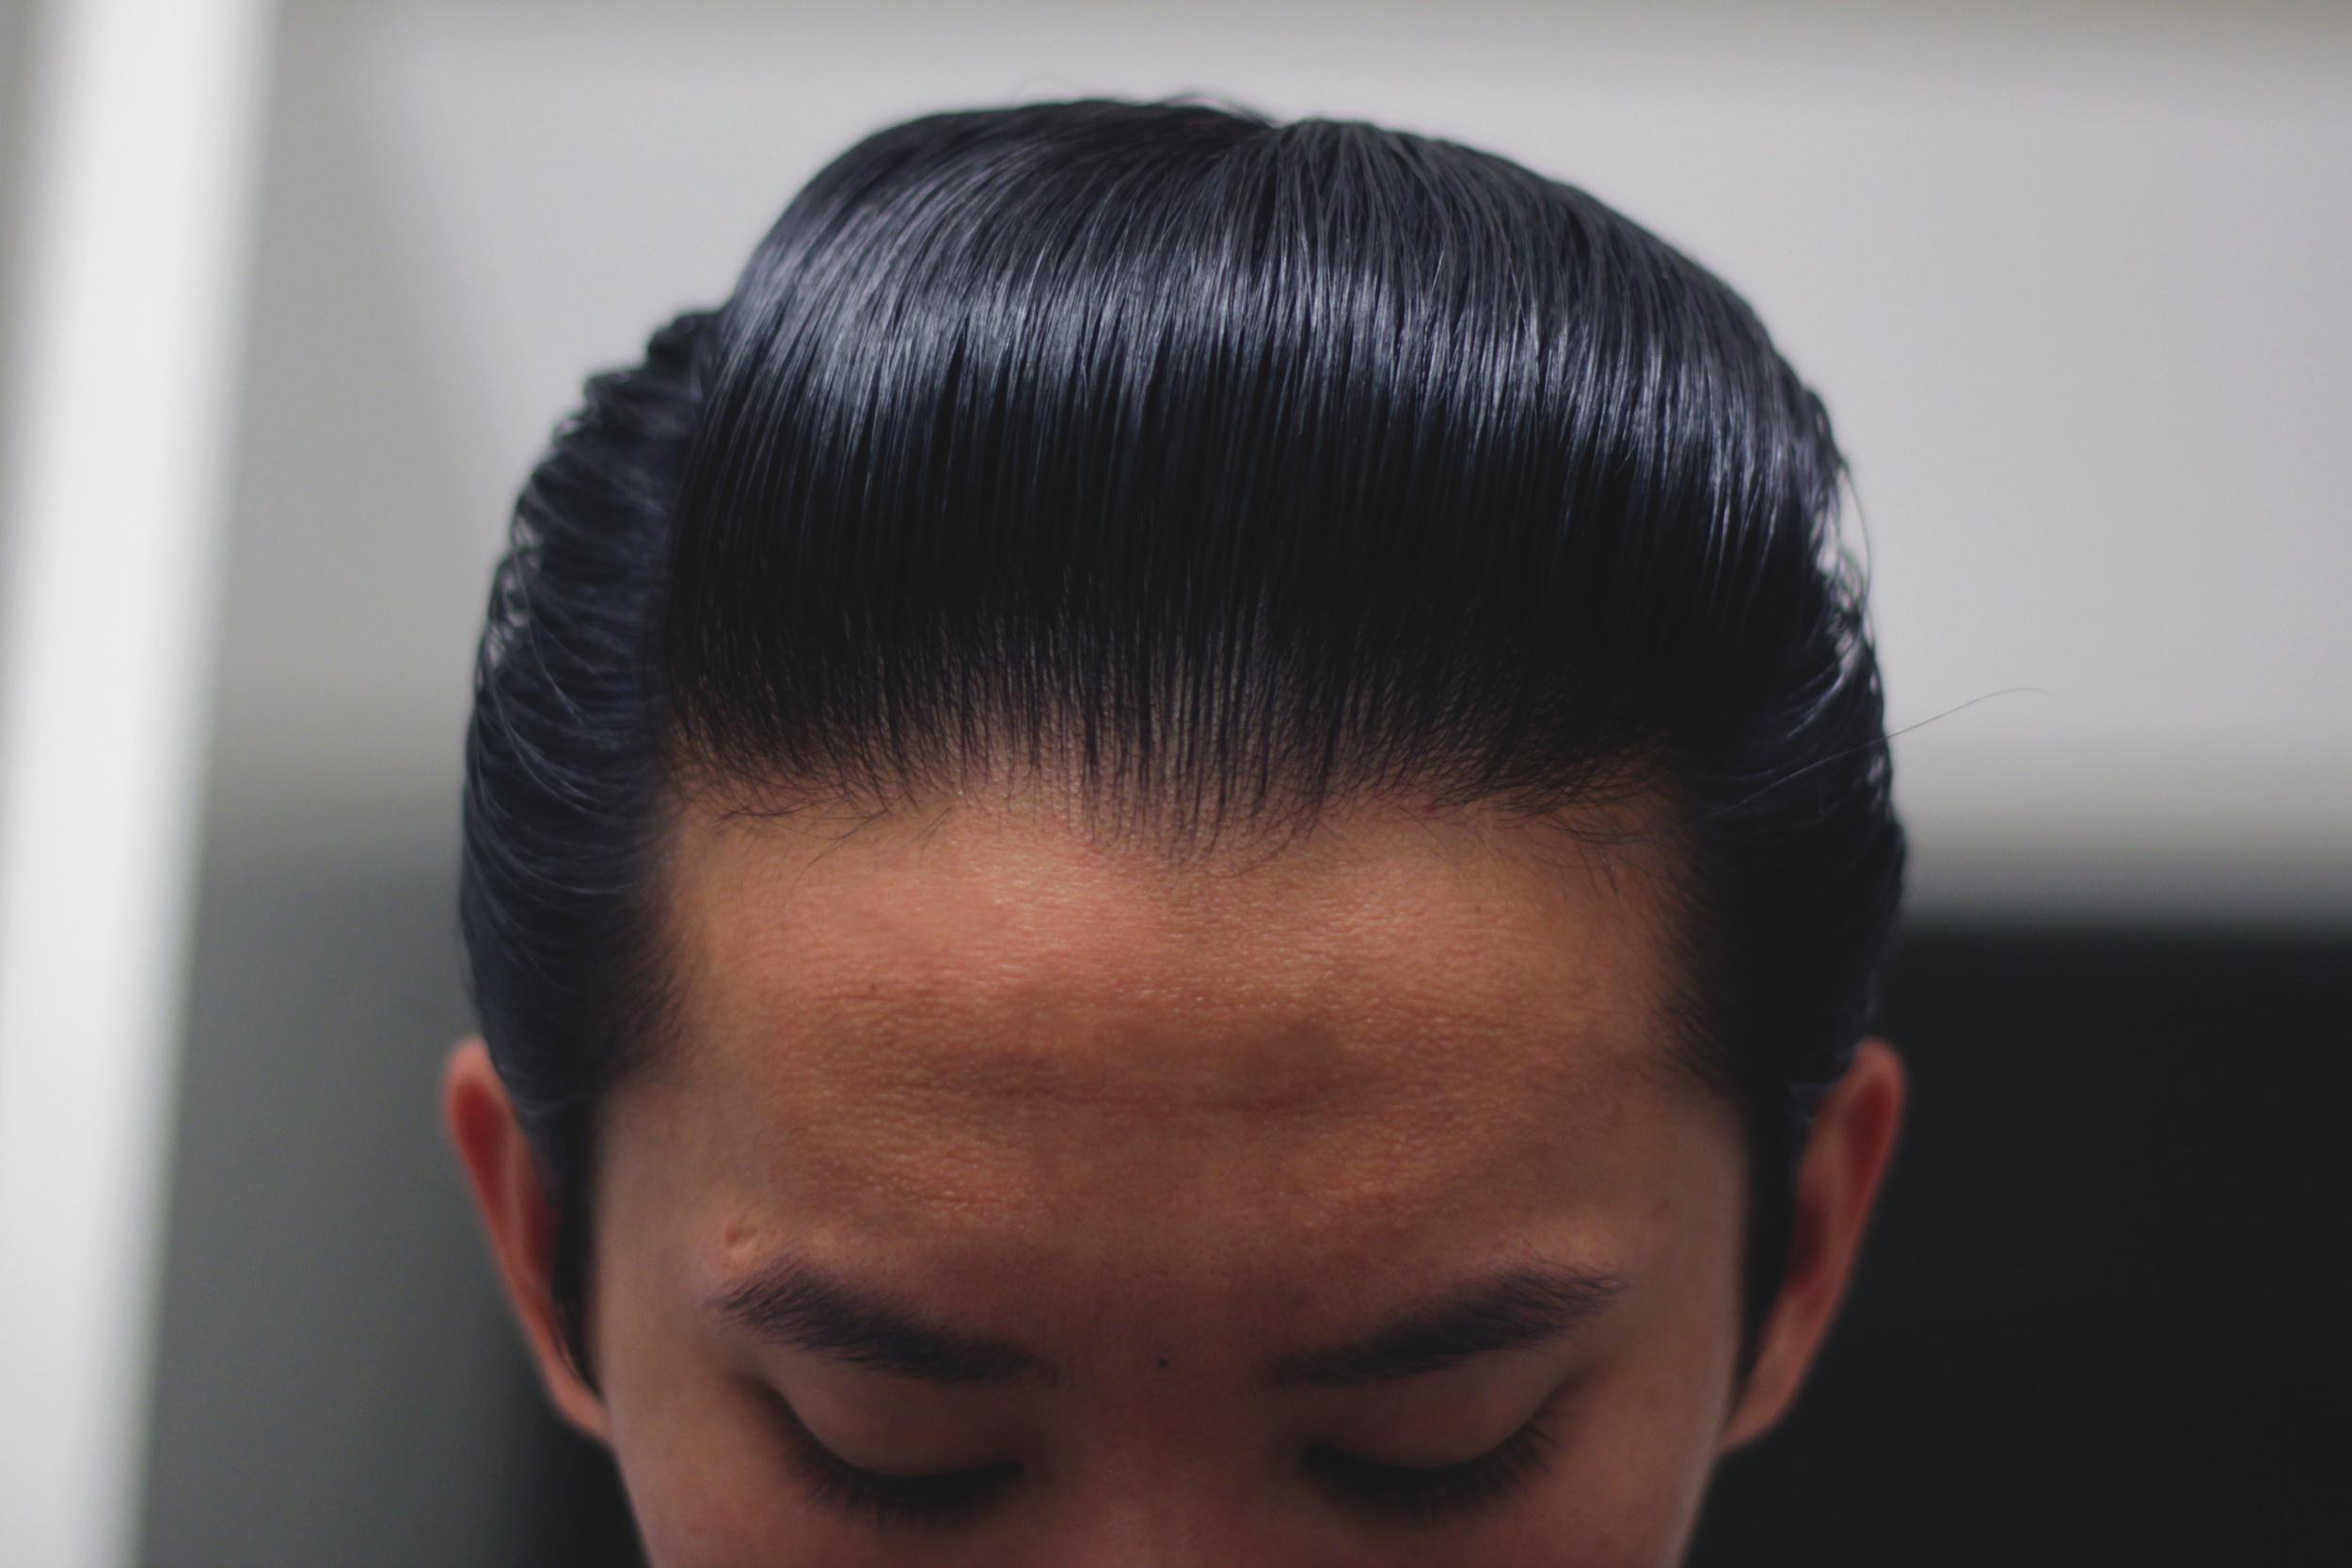 Taylor of Old Bond Street Hair Wax pomp